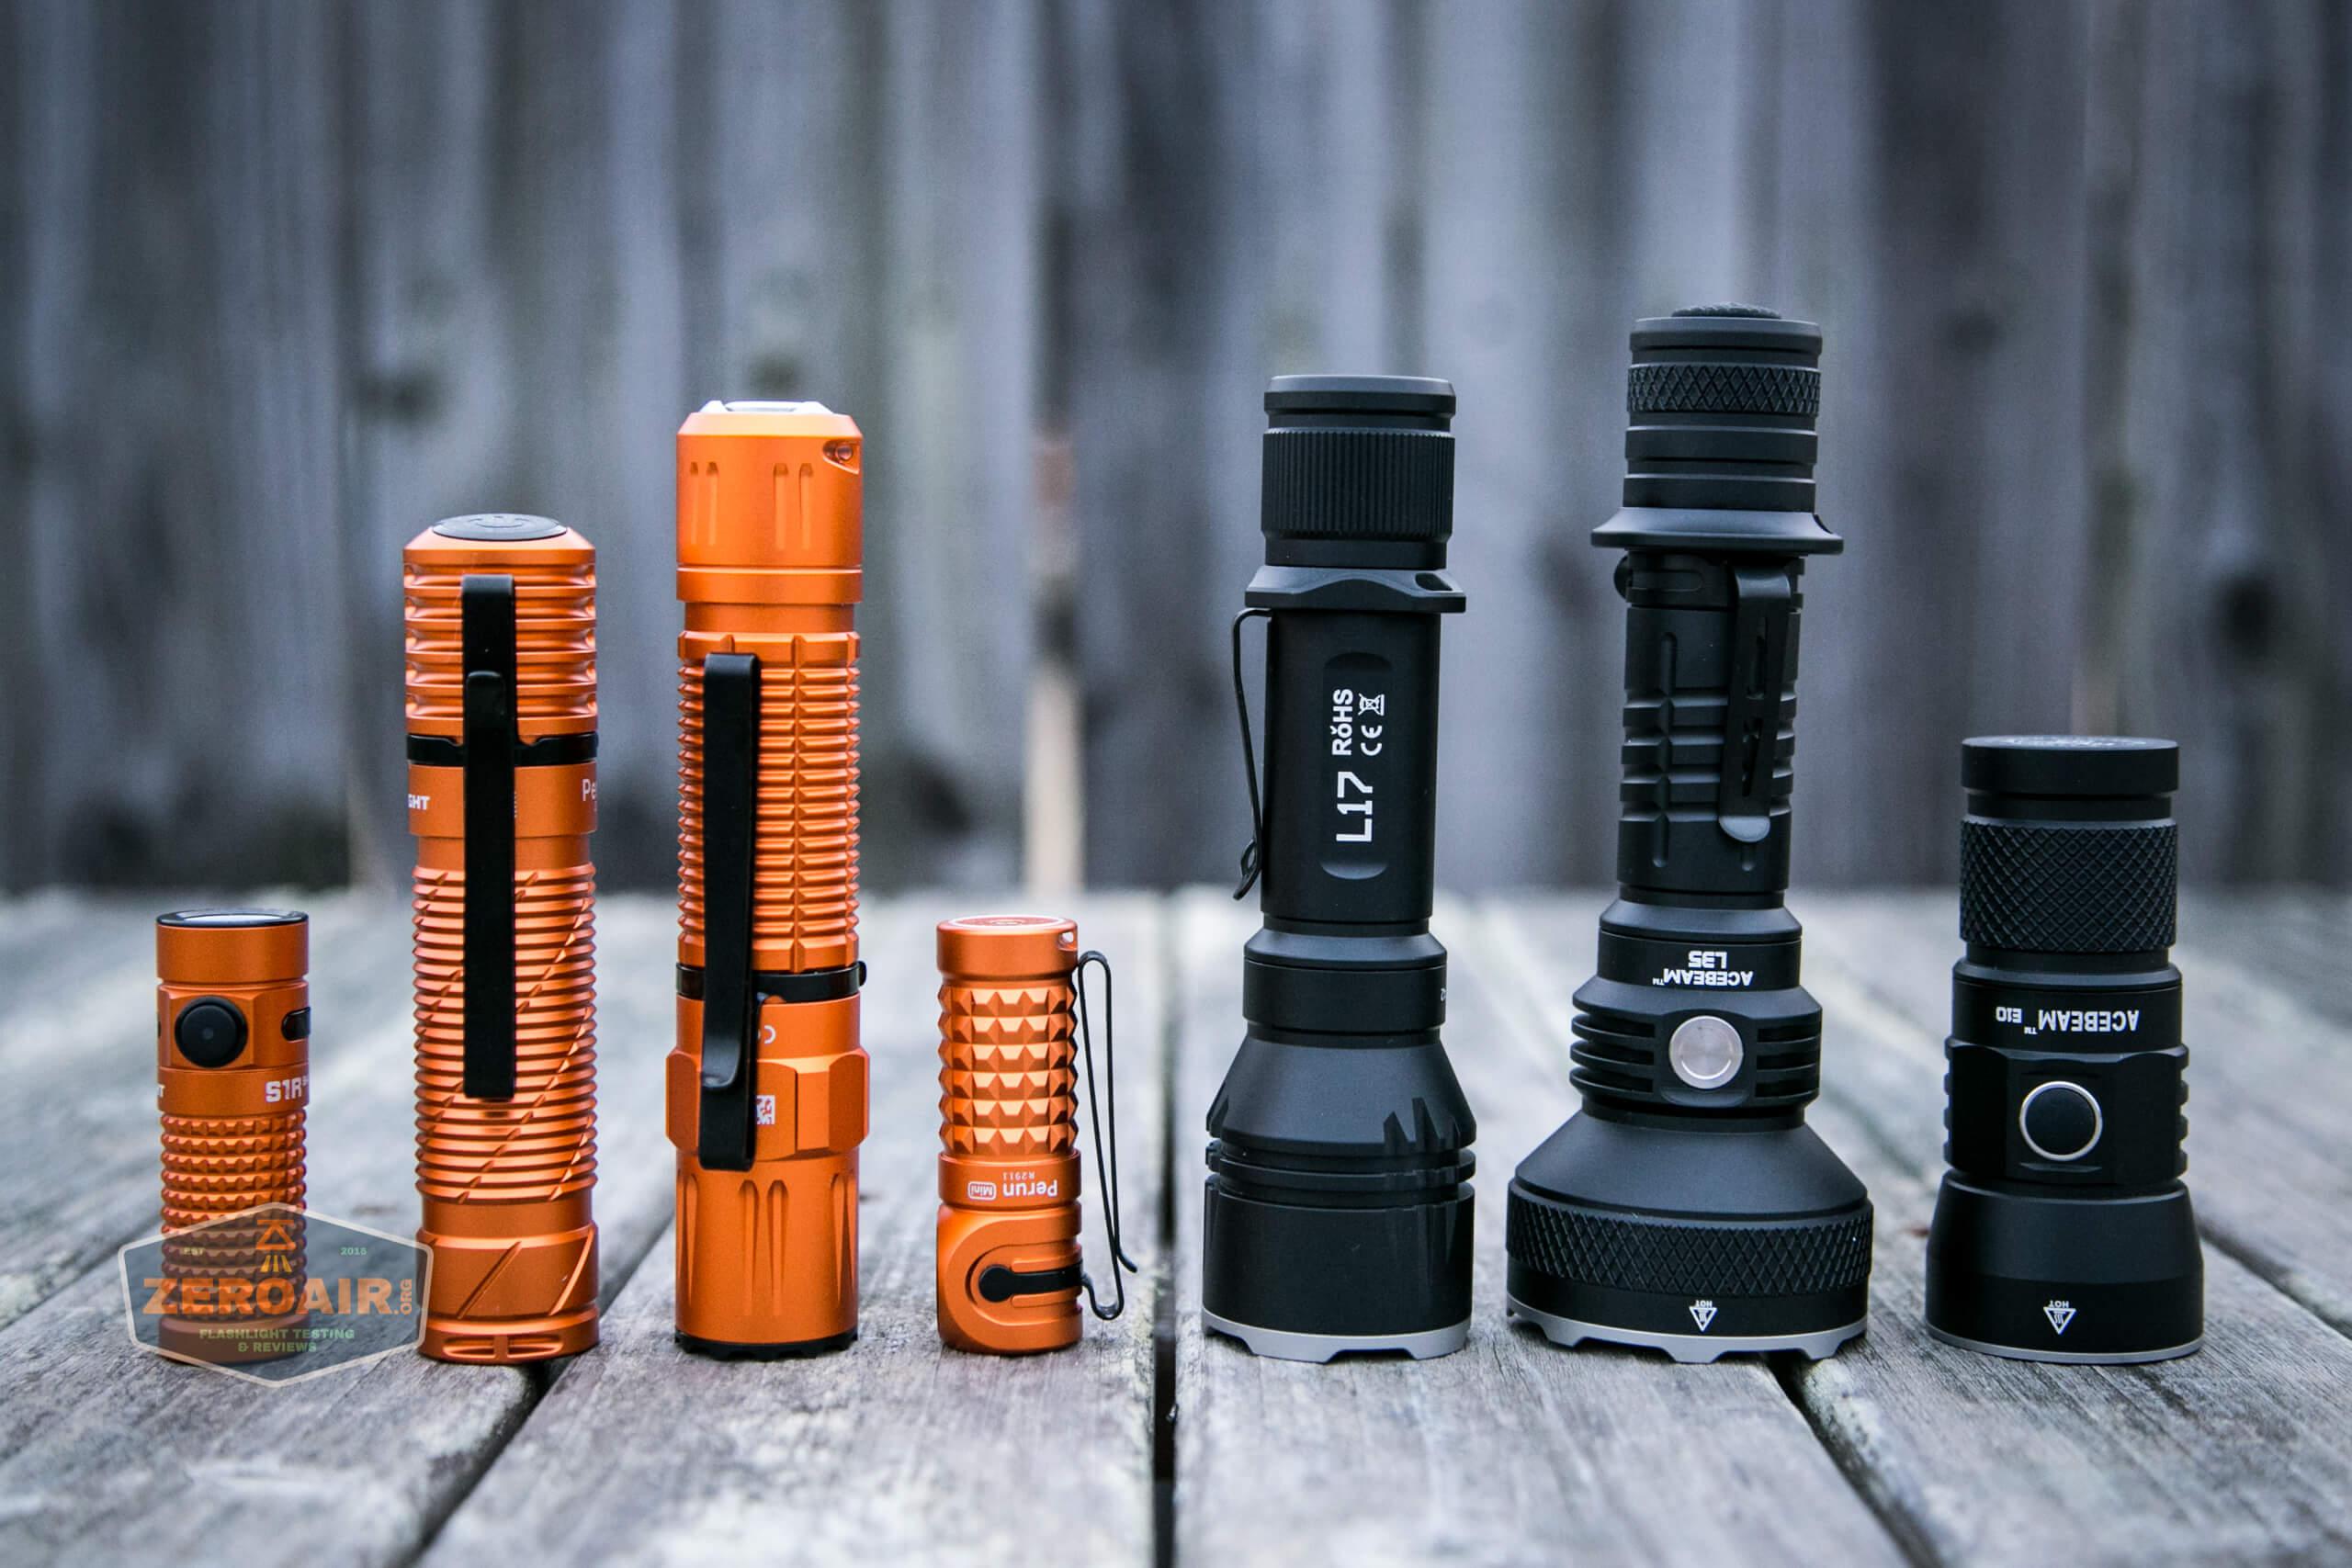 Olight M2R Pro Warrior Orange with black acebeams